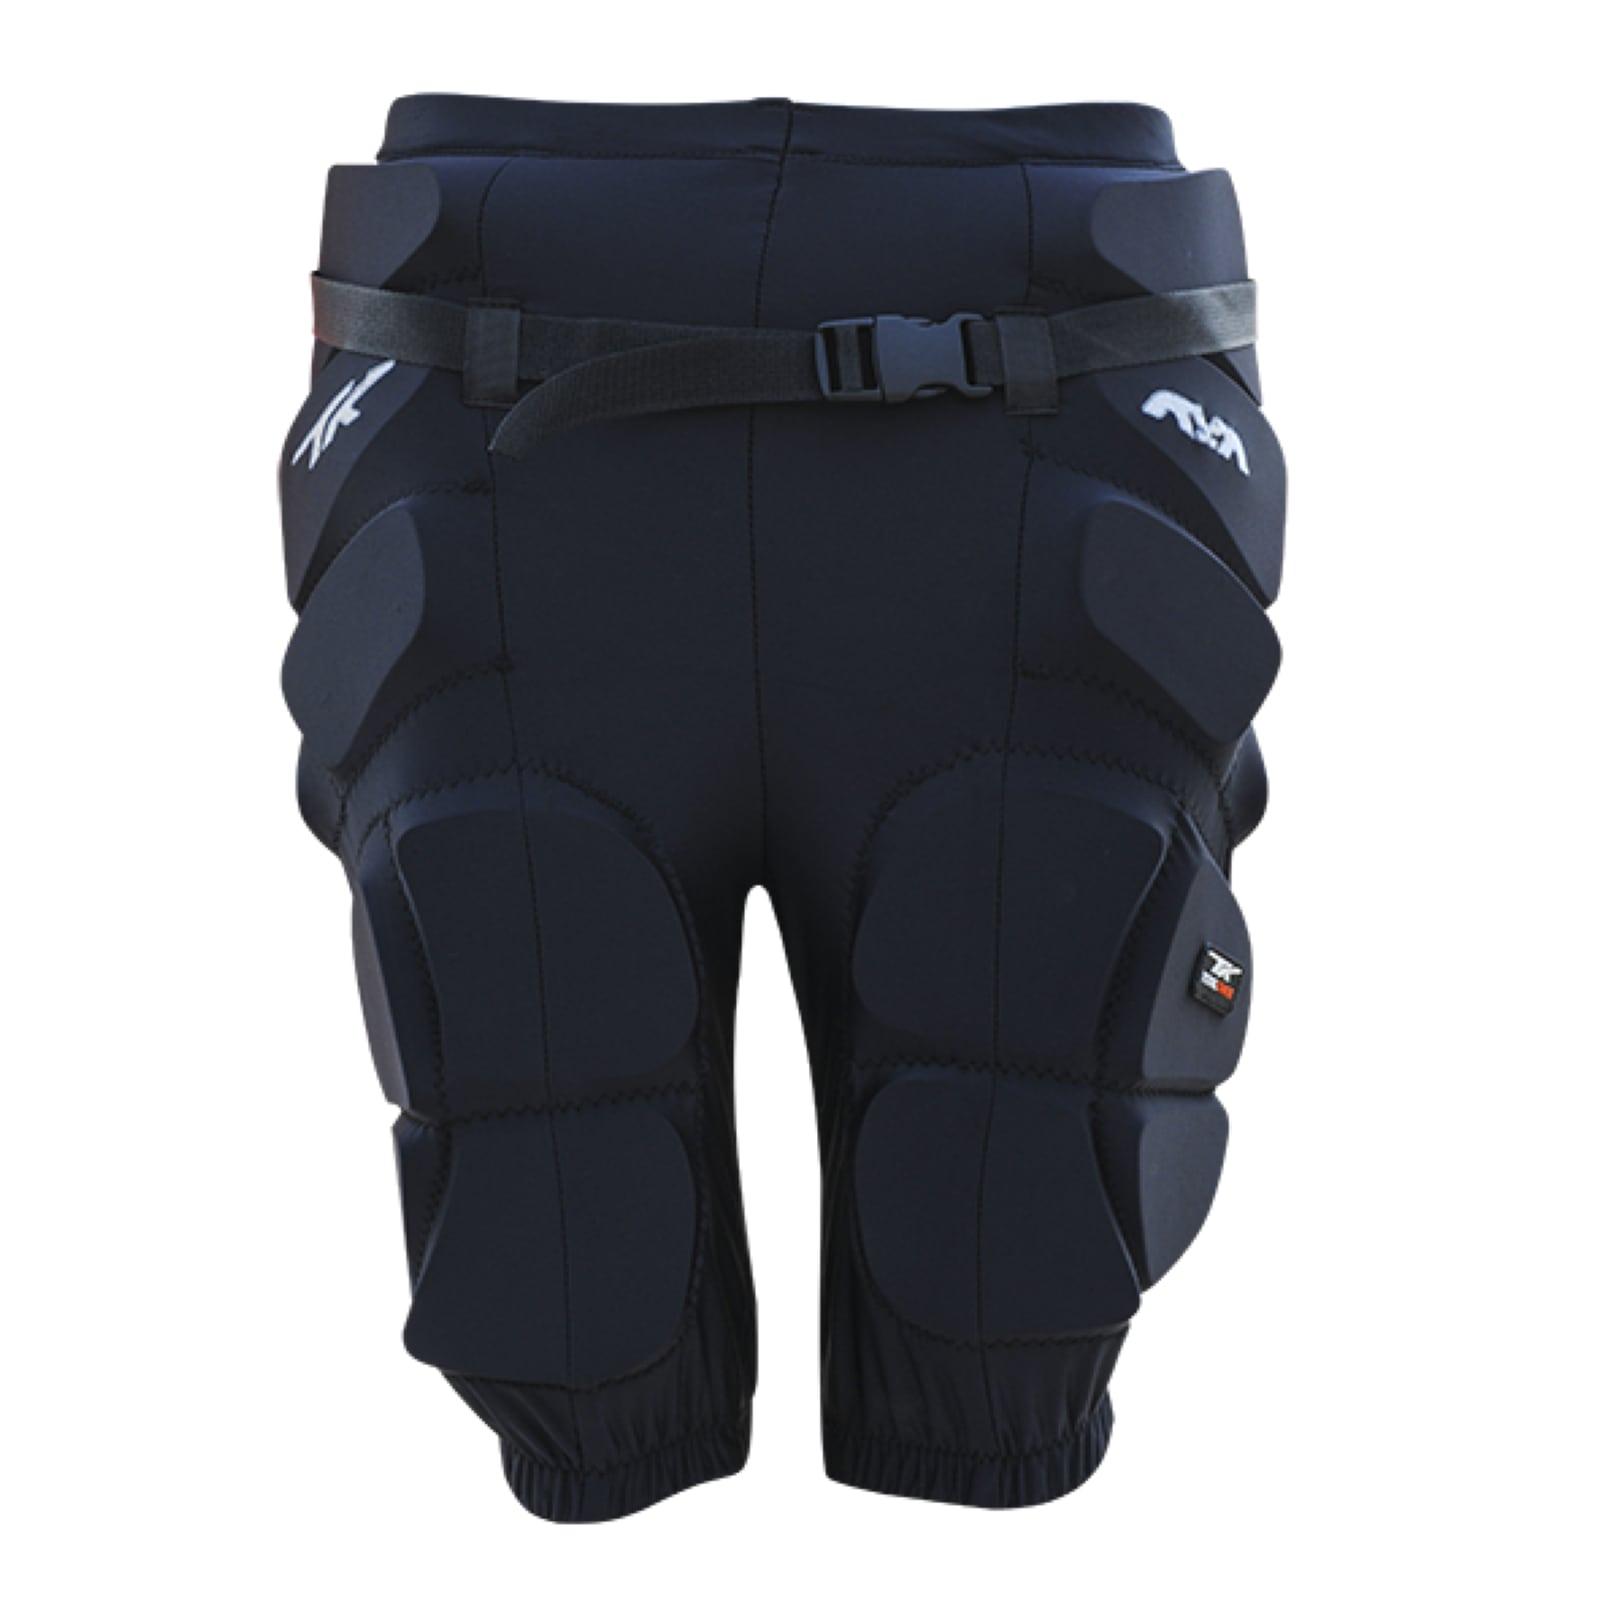 TK PPX 3.2 Hockey Goalkeeping Safety Pants